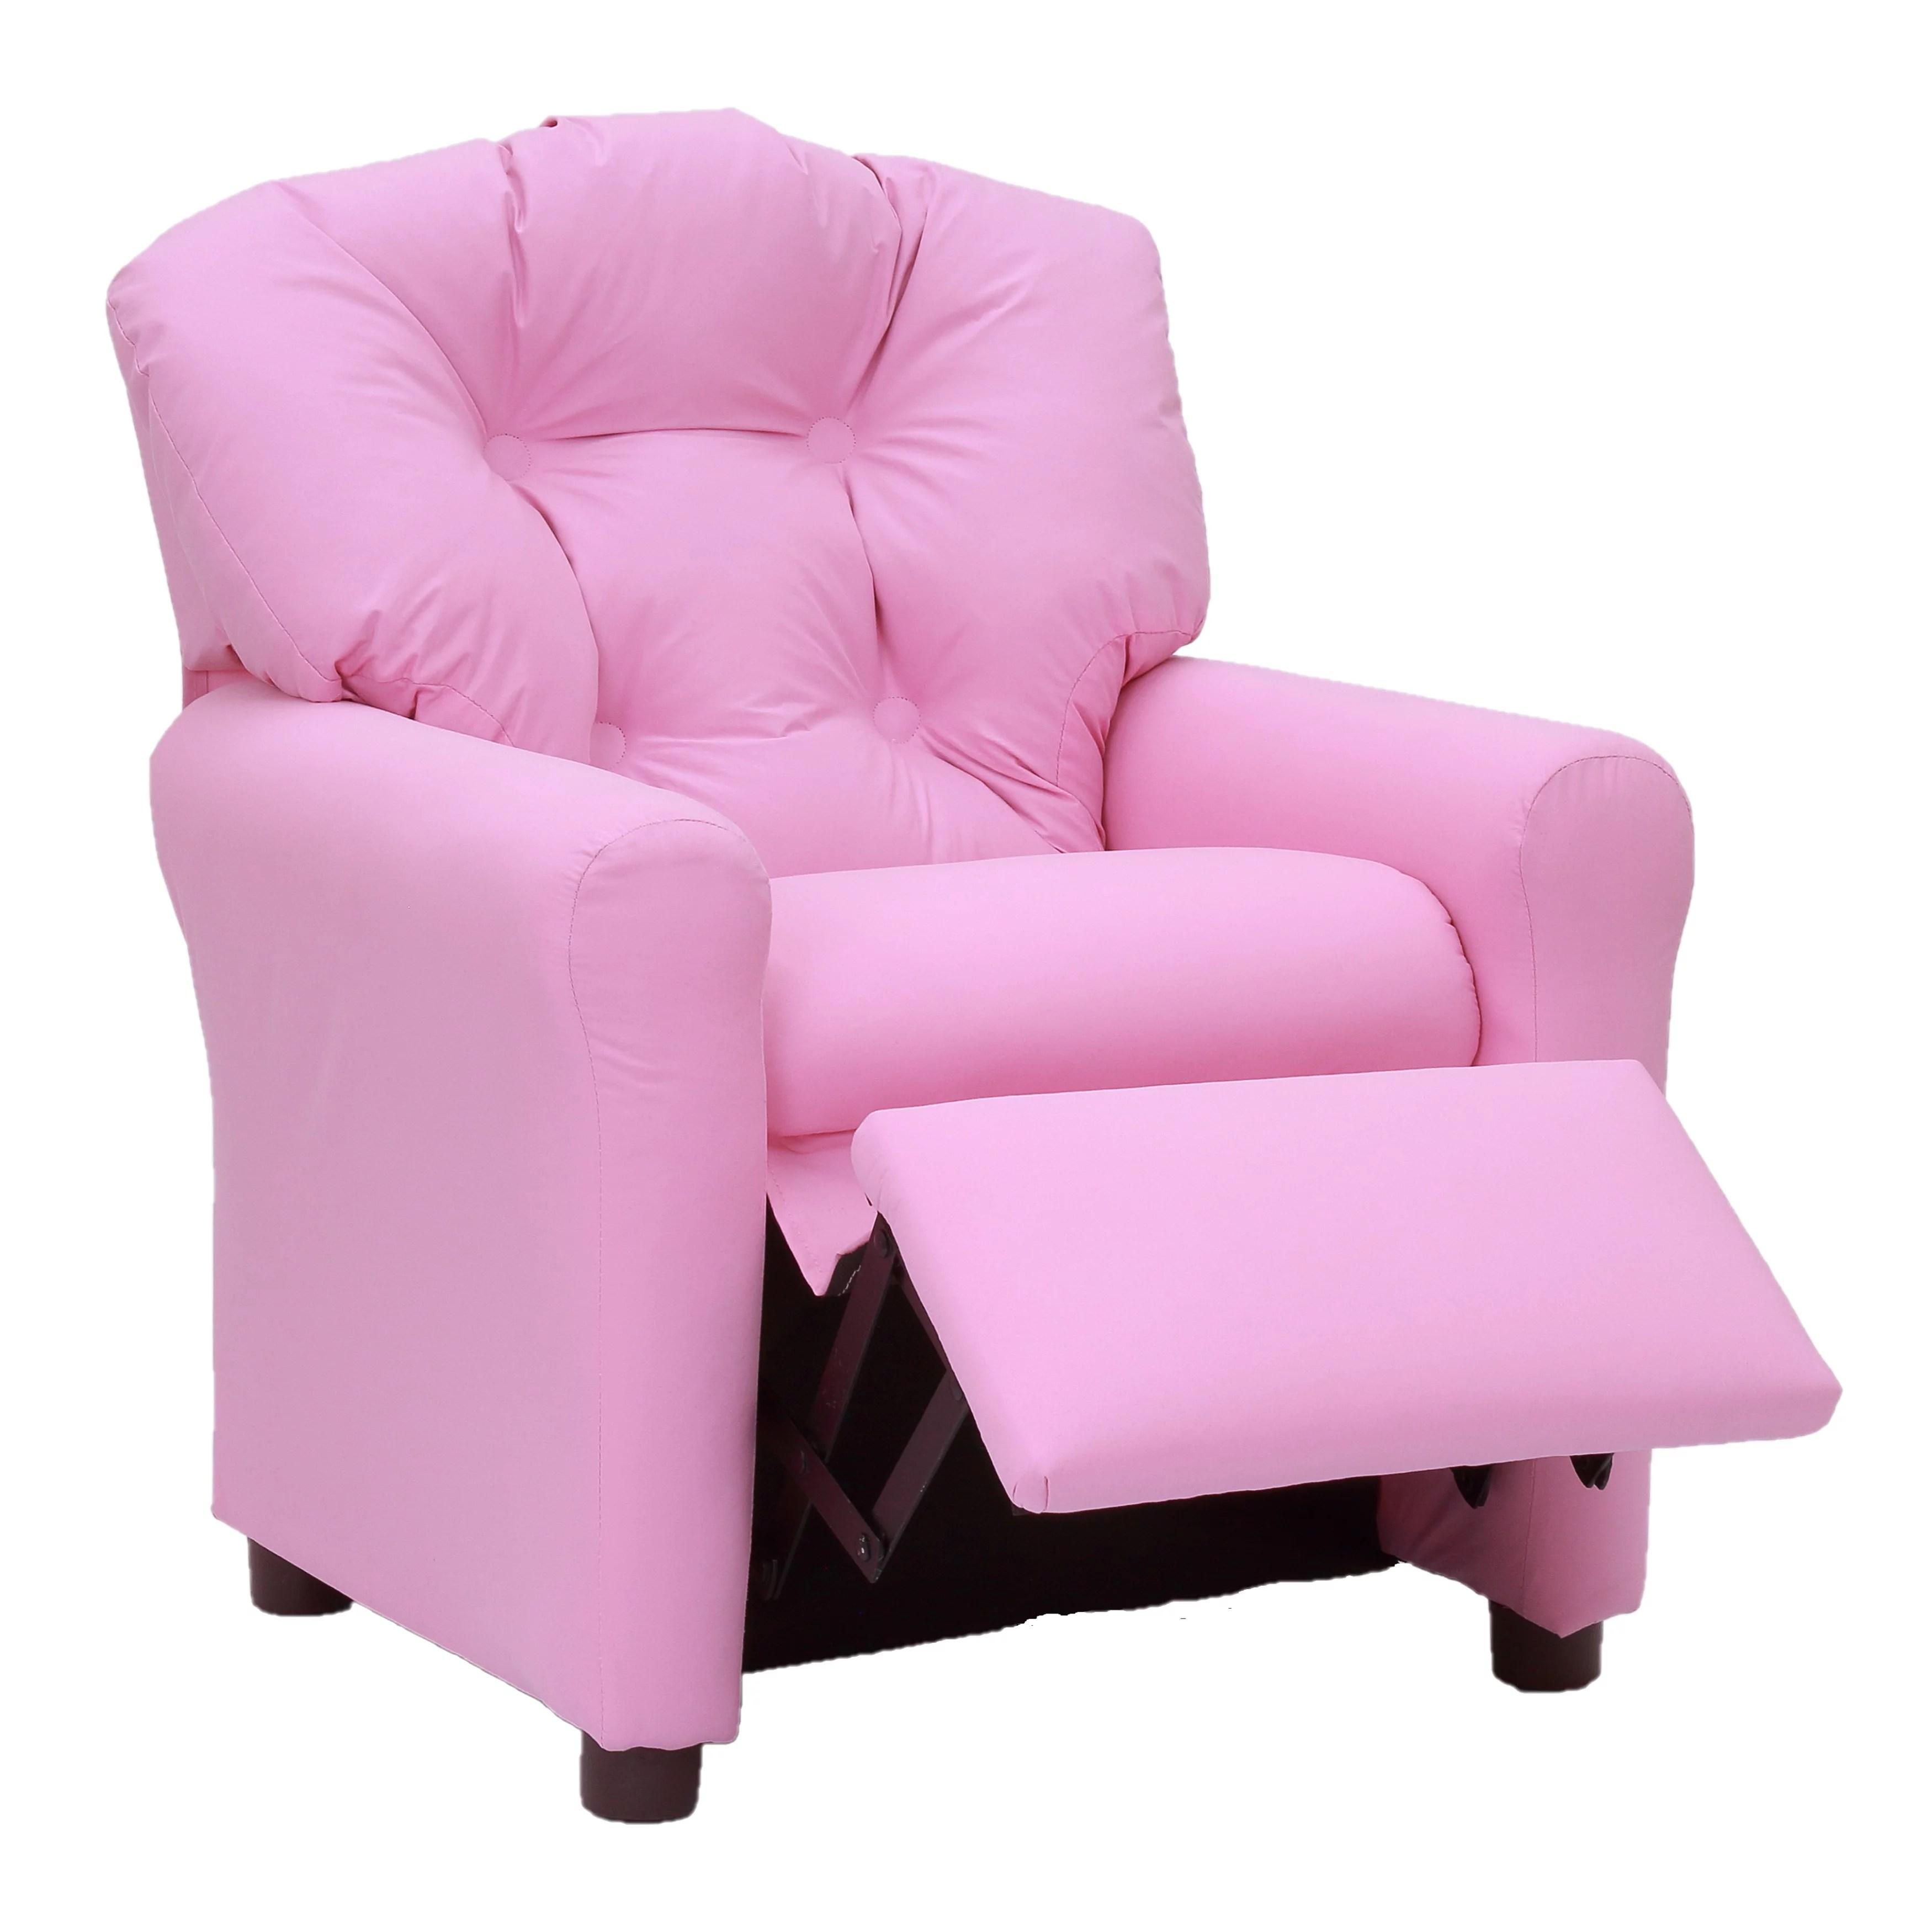 kids tv chair stool folding crew furniture traditional recliner multiple colors walmart com